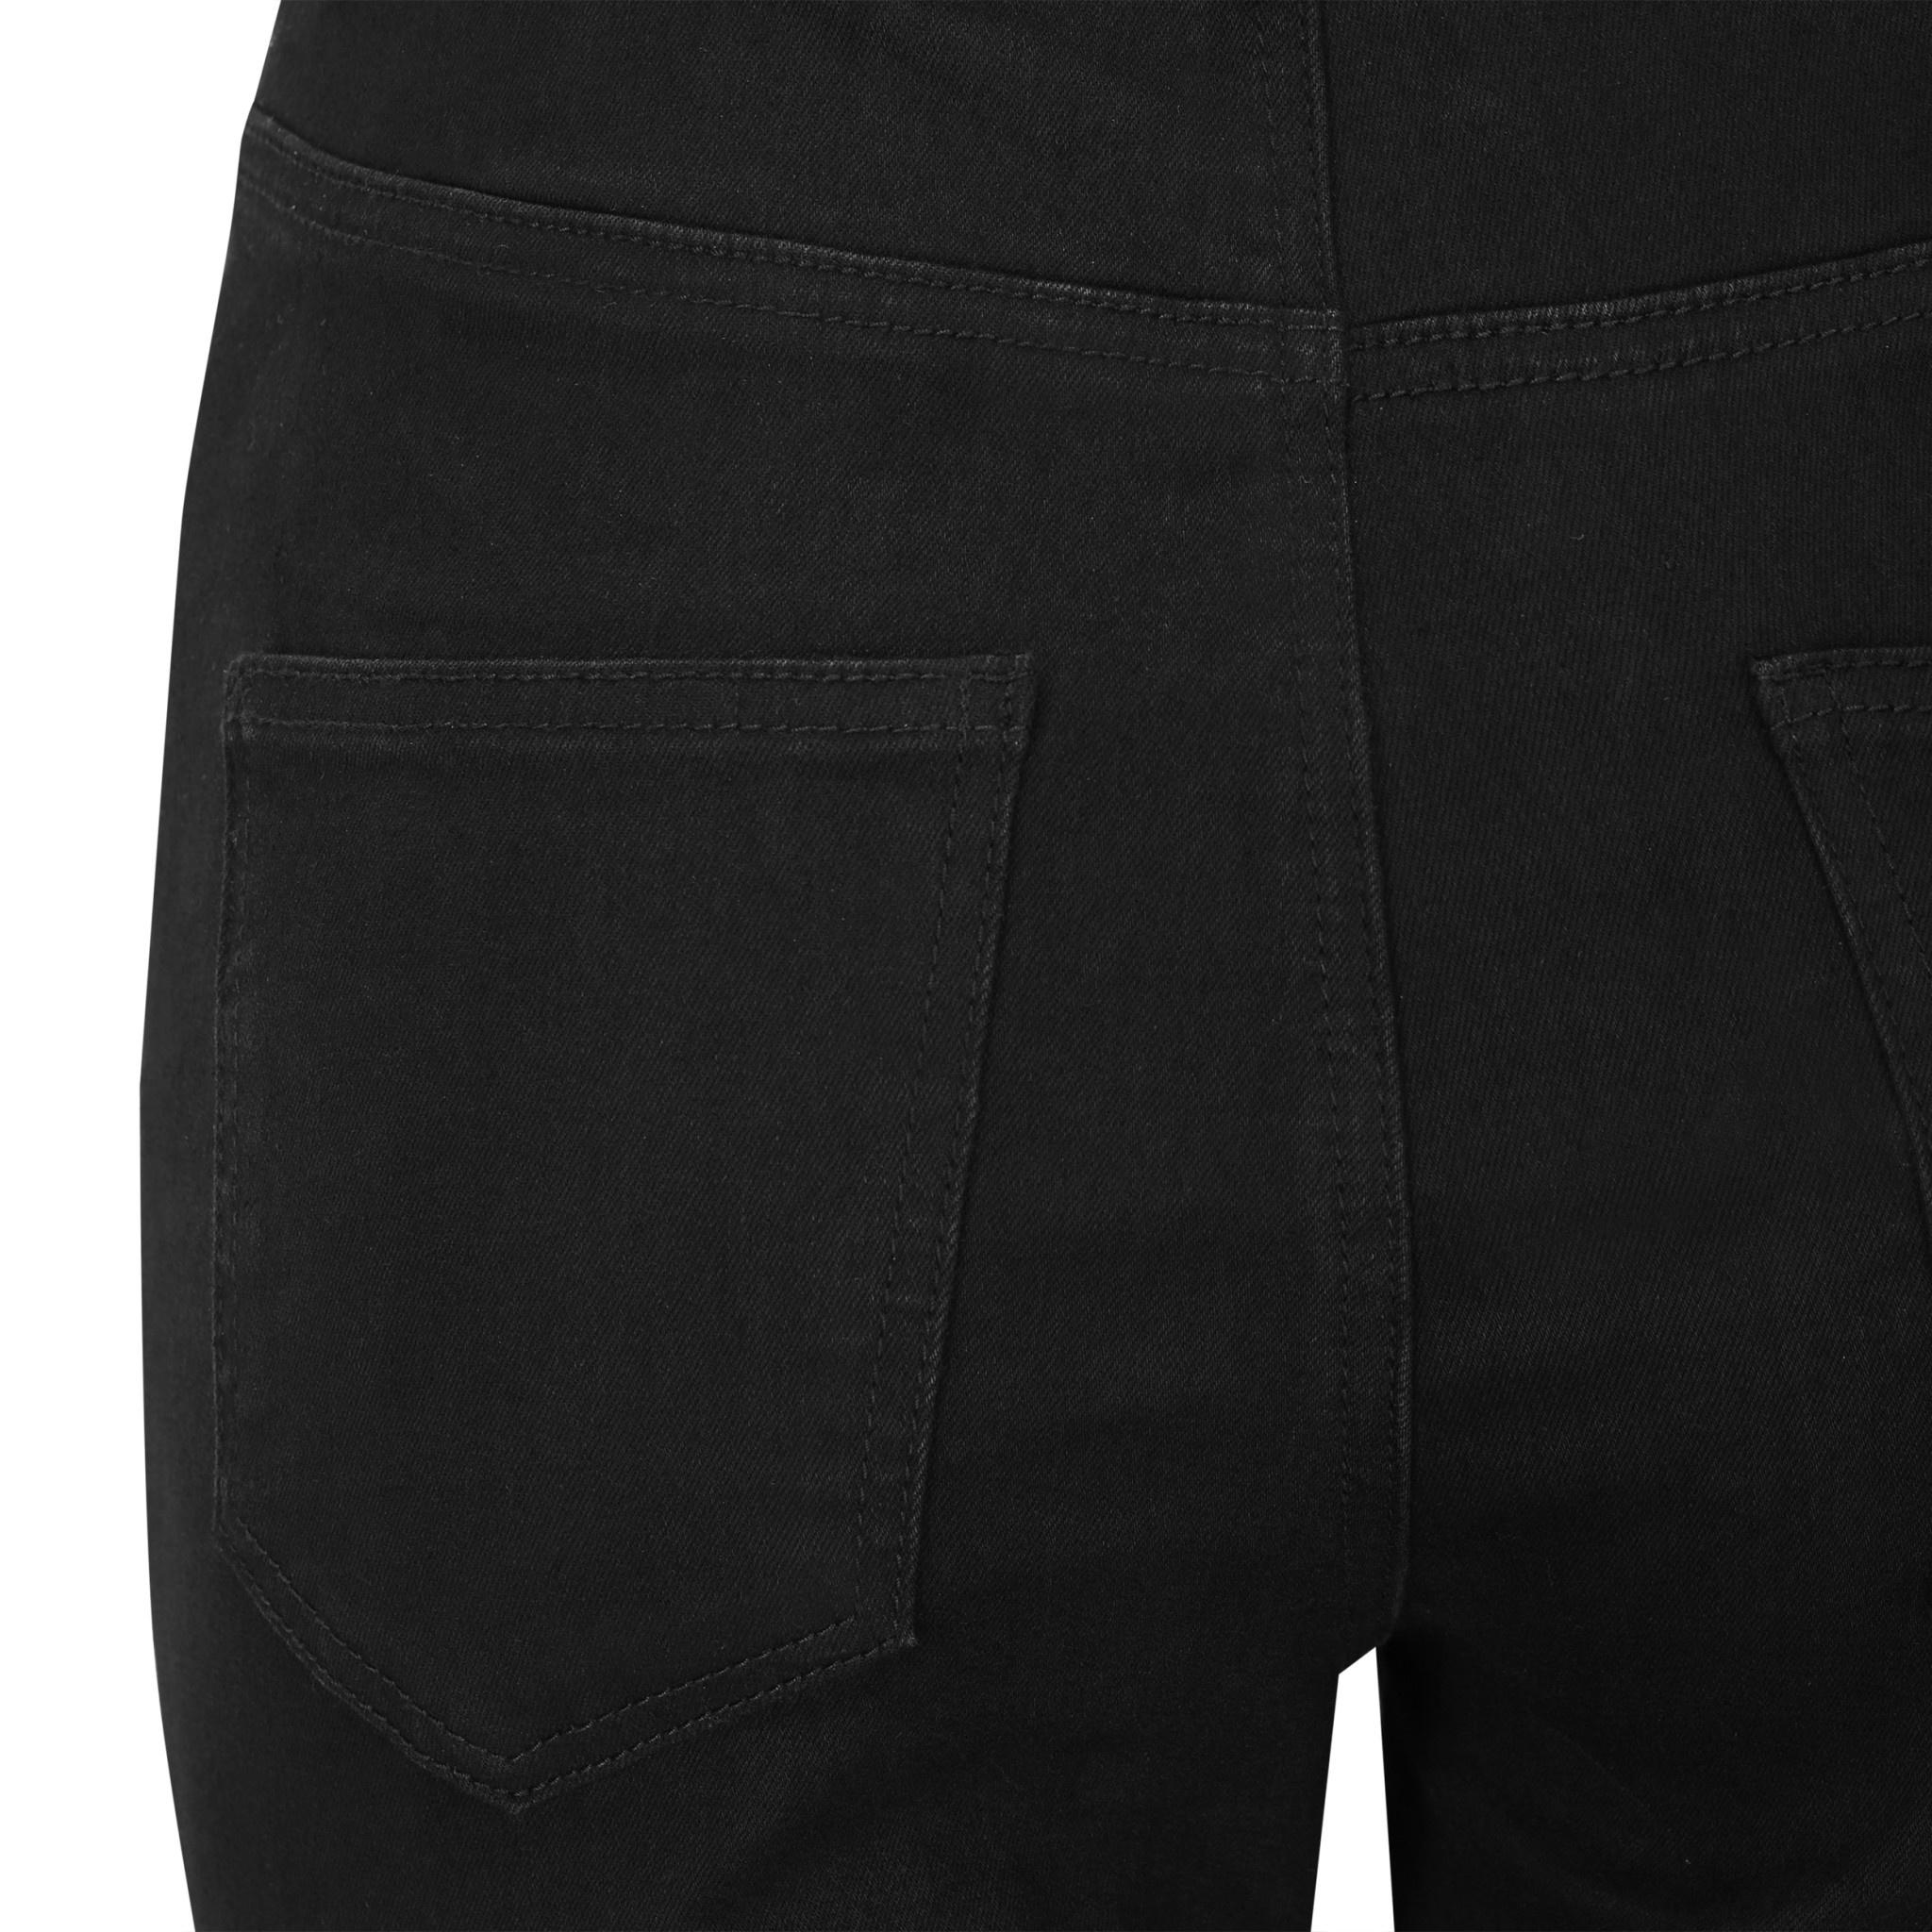 Soft Rebels Highwaist Slim Jeans - Black - 804